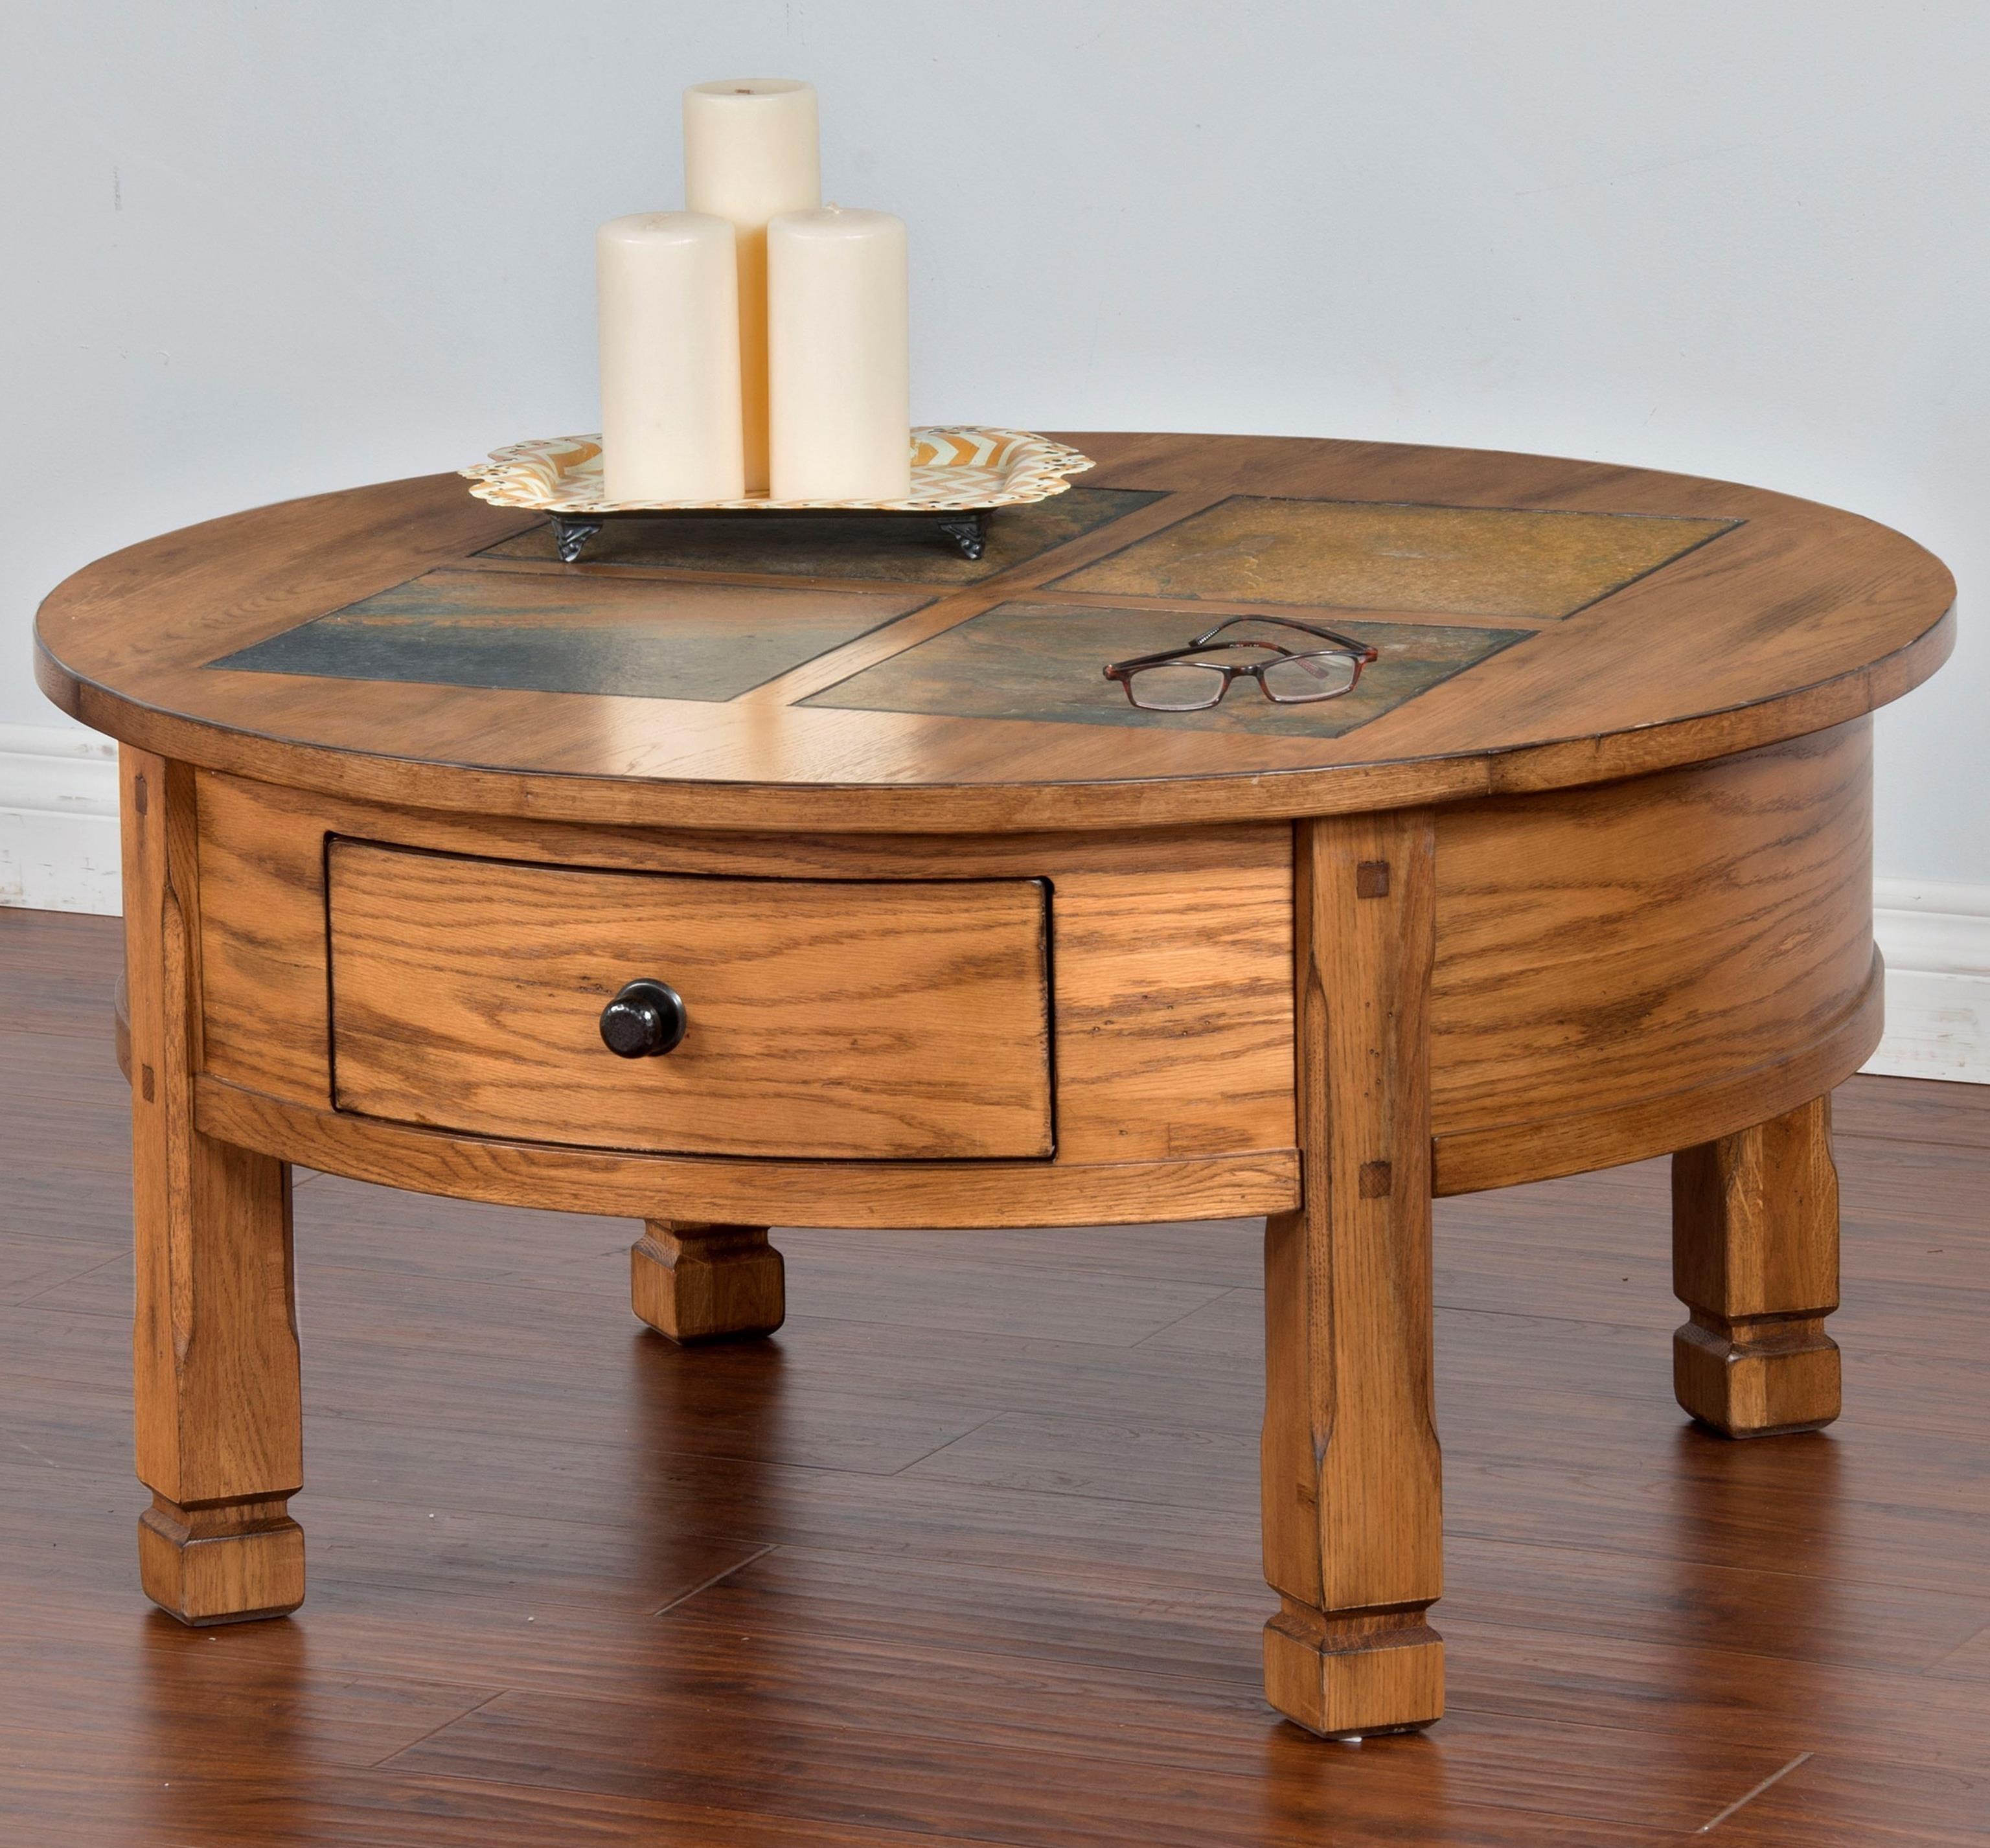 Sunny Designs Sedona Round Coffee Table - Item Number: 3143RO-CR